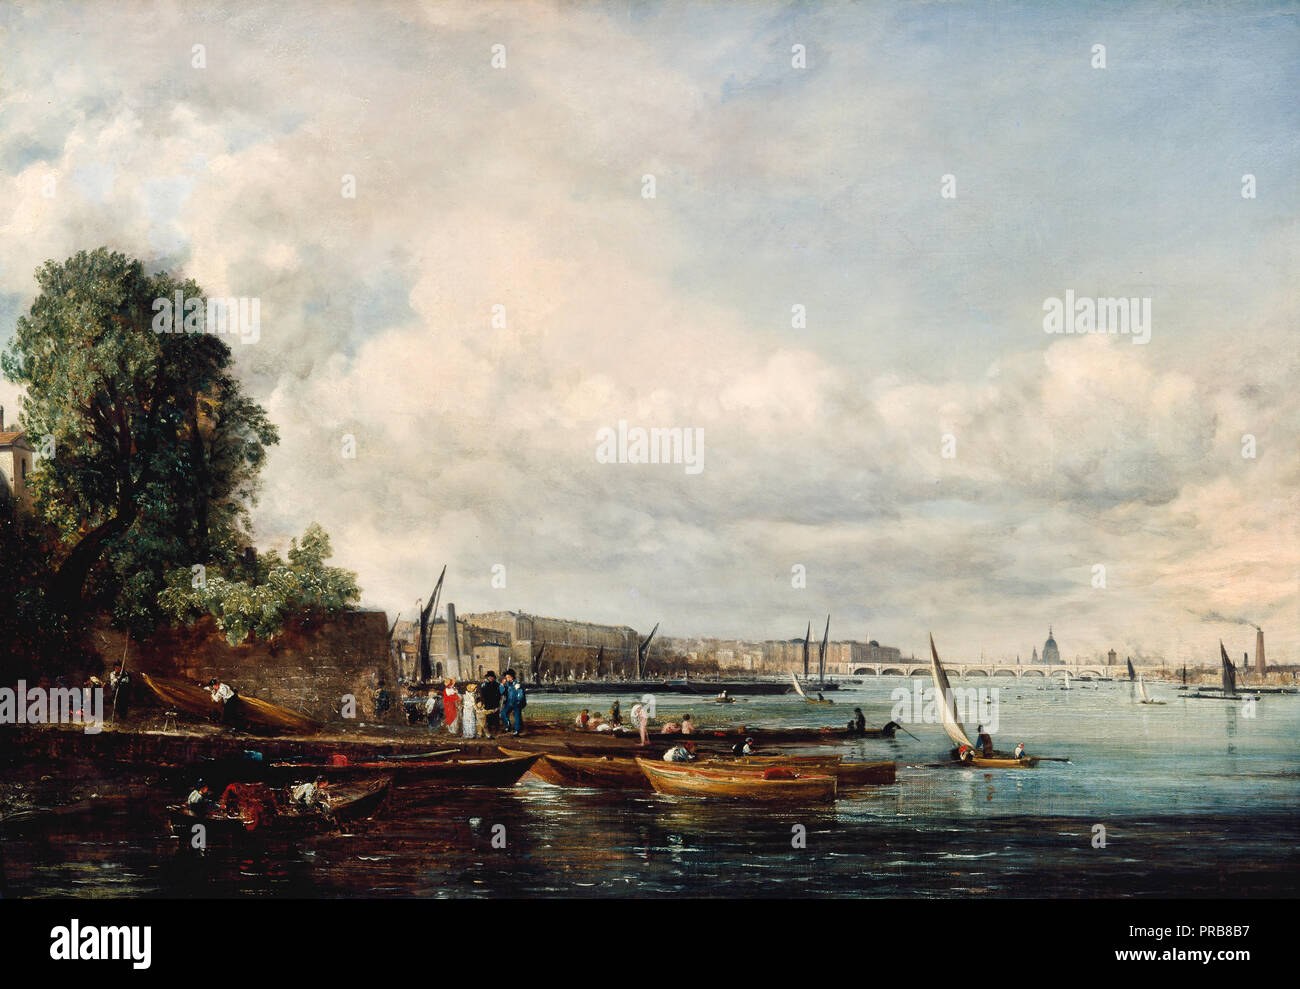 John Constable, Waterloo Bridge, circa 1820 Óleo sobre lienzo, Museo de Arte de Cincinnati, Cincinnati, Ohio, USA. Imagen De Stock